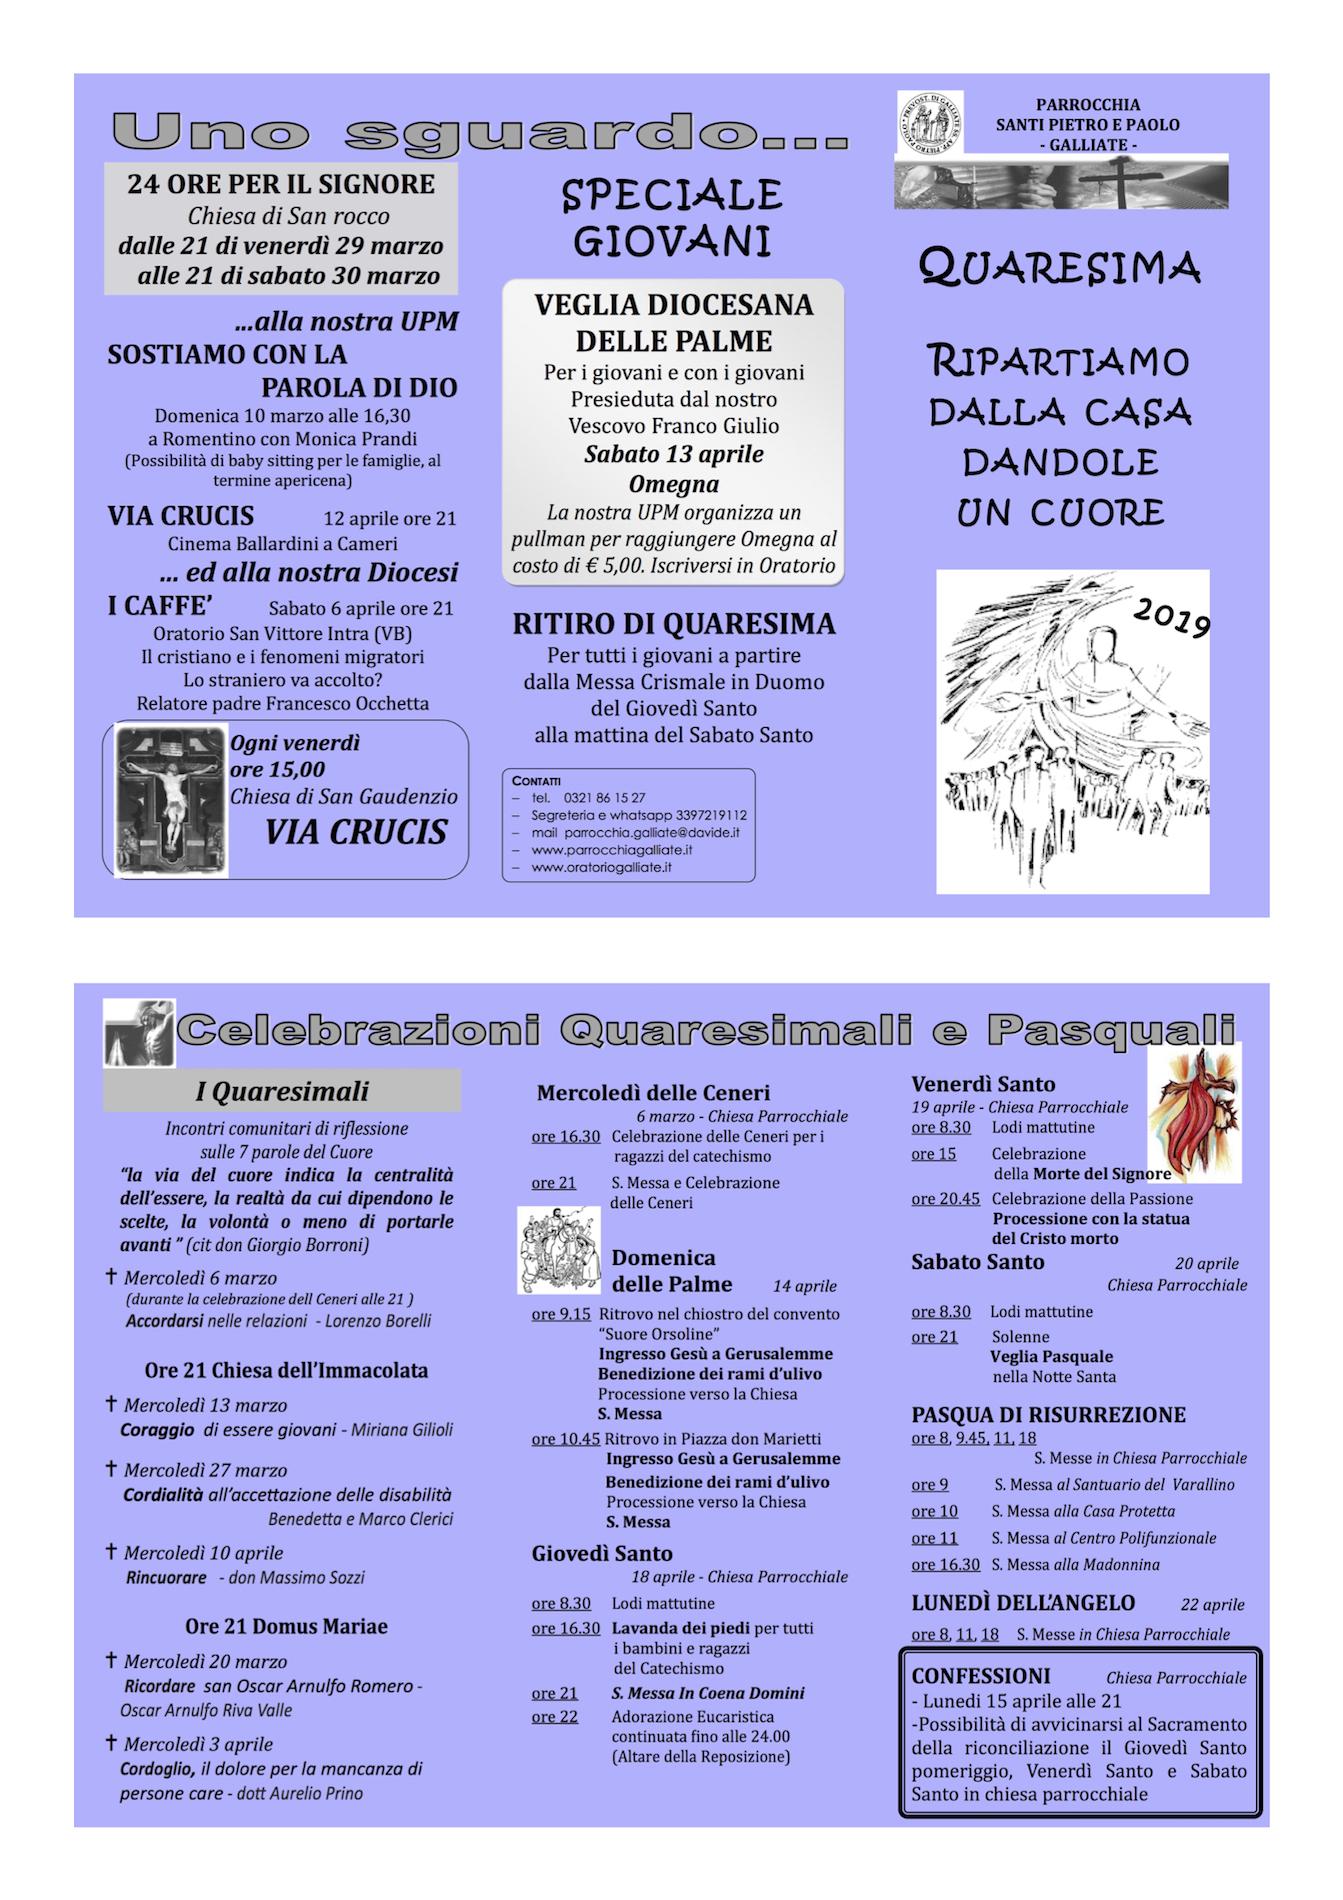 bp190306-Quaresima2019-VolantinoParrocchia_web_lq